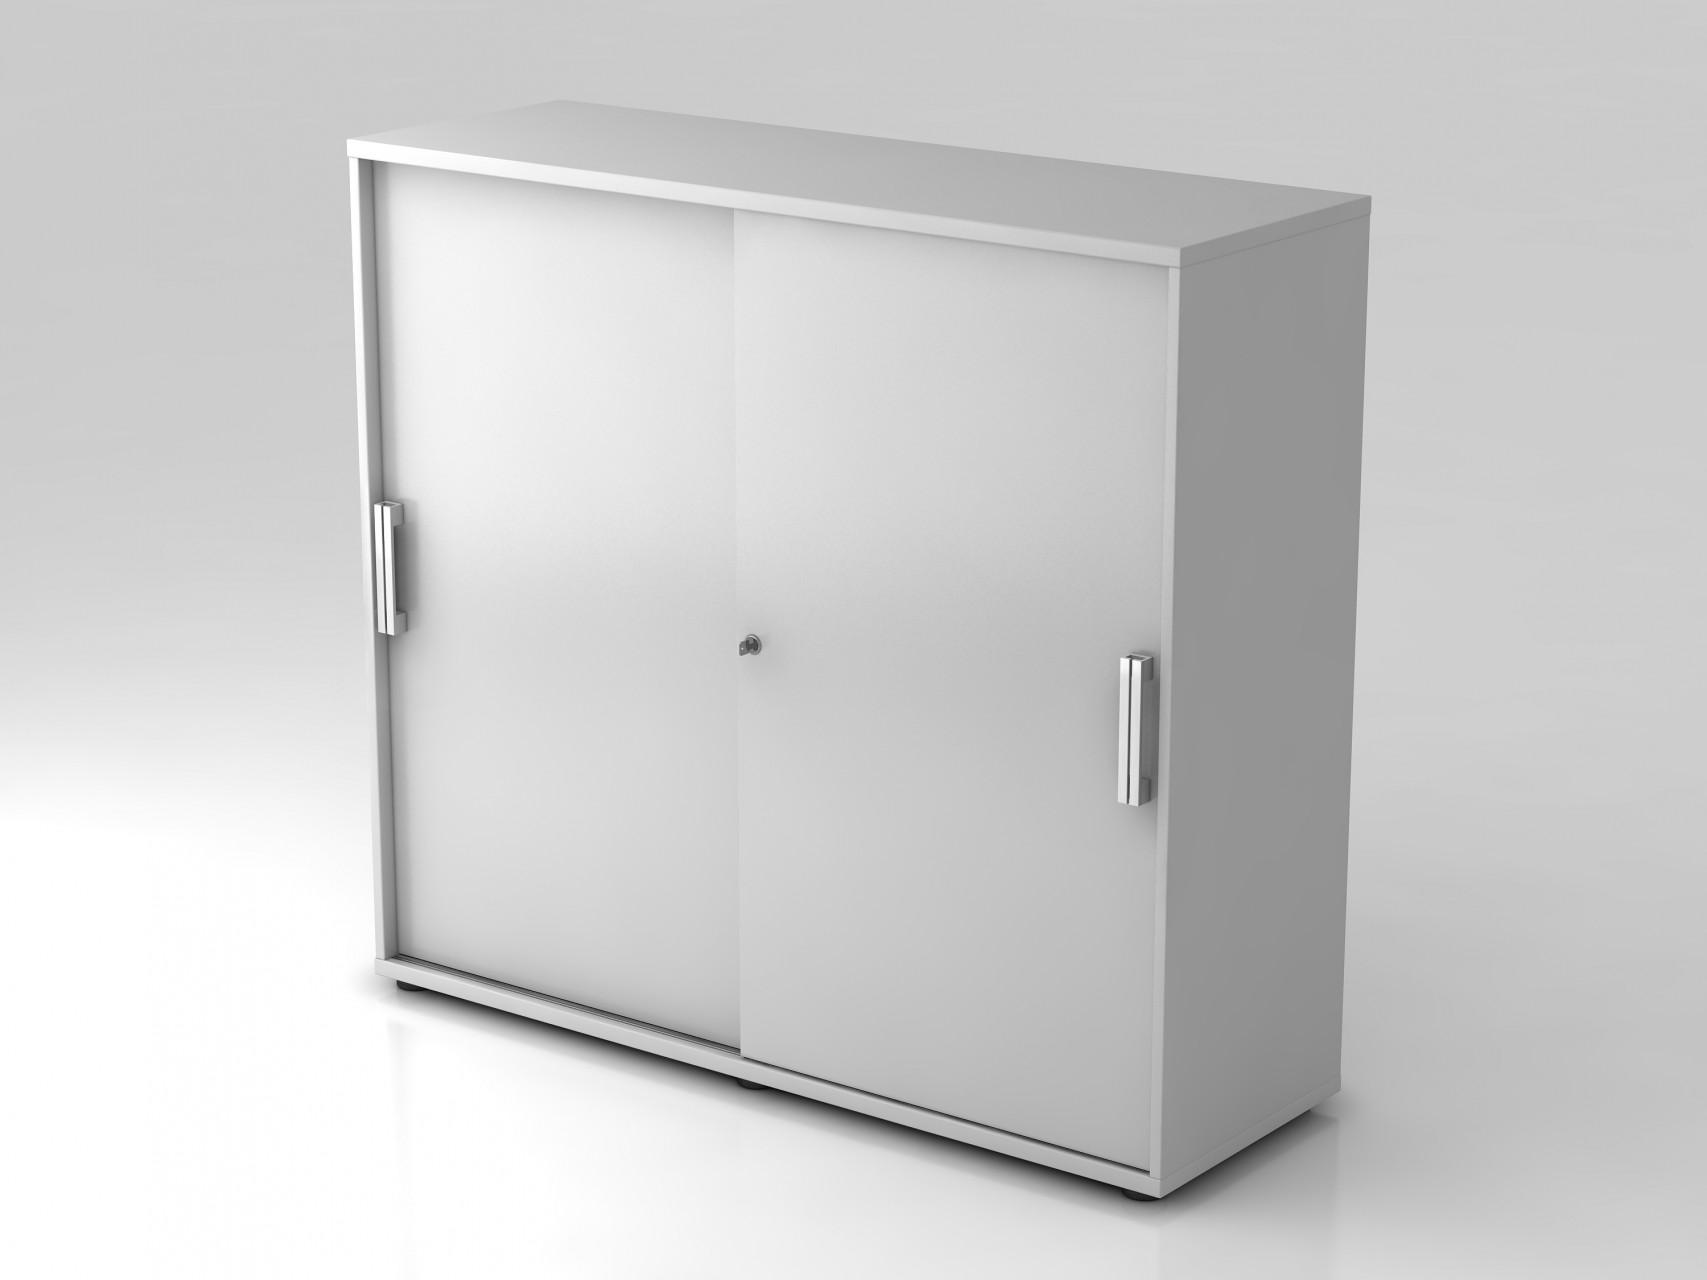 Armoire designe armoire porte coulissante profondeur 40 for Armoire 110 cm porte coulissante